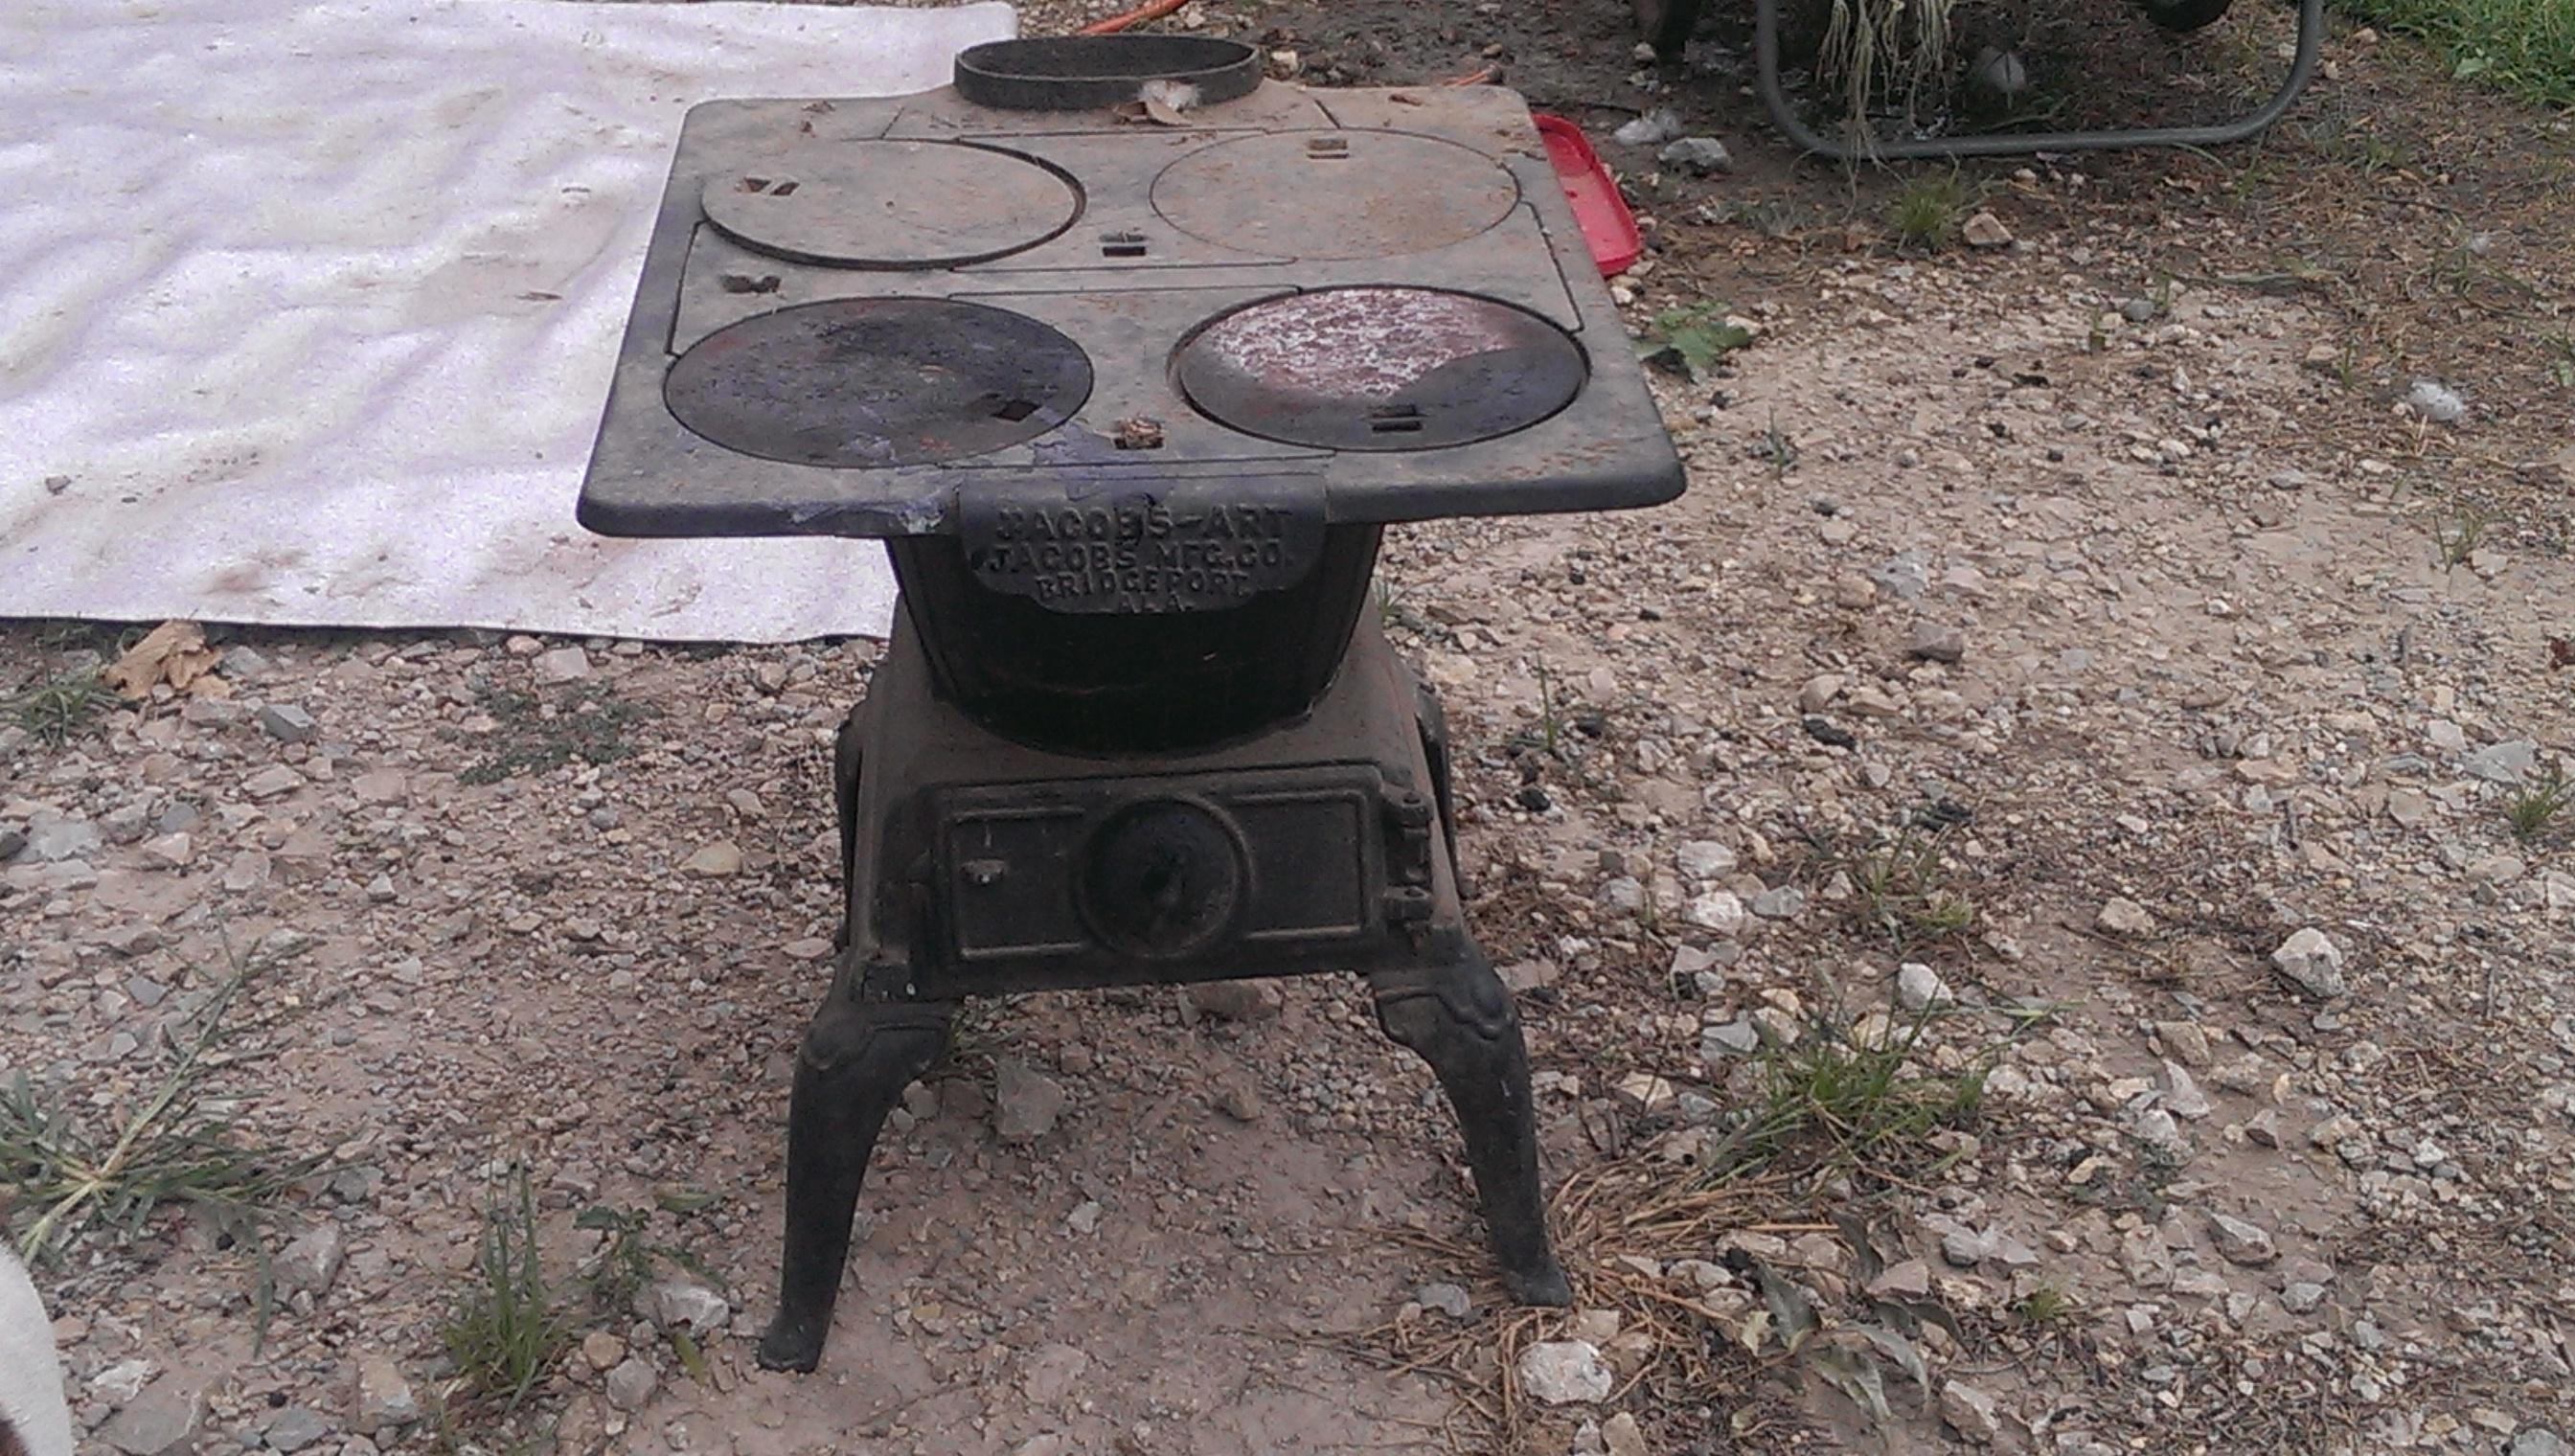 Jacobs Art Potbelly 4 Burner Wood Or Coal Cook Stove